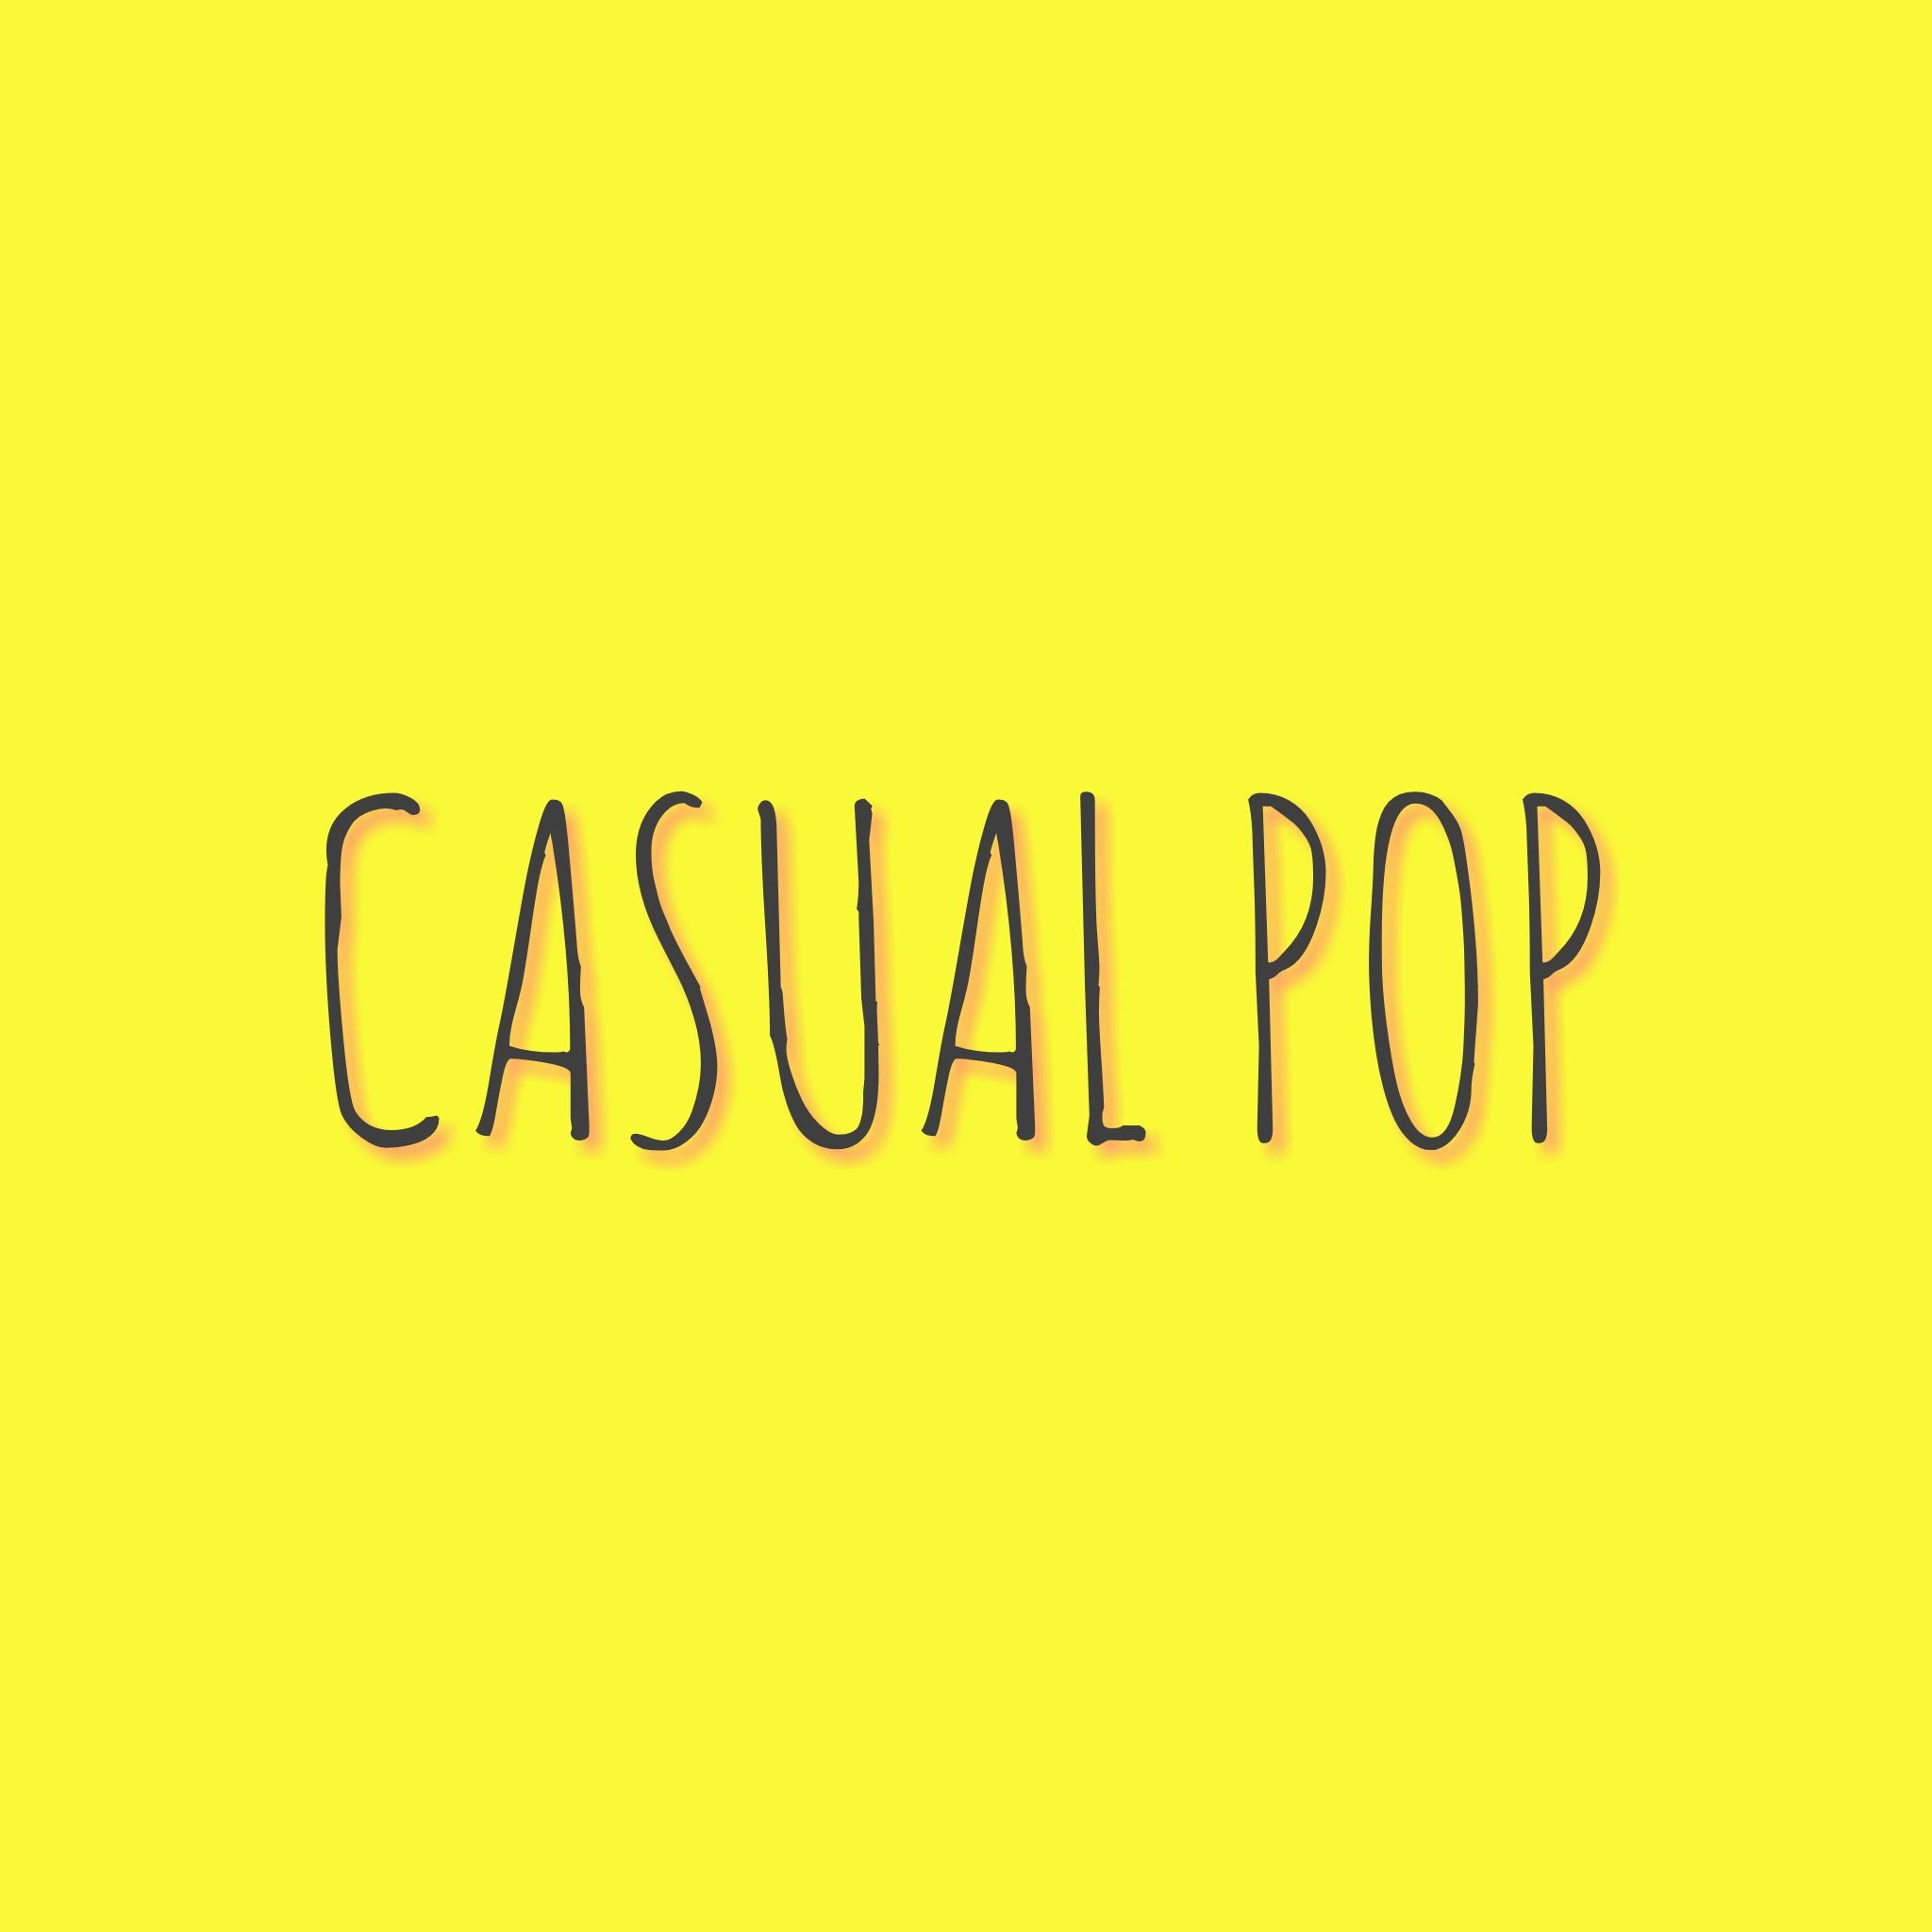 CASUAL POP